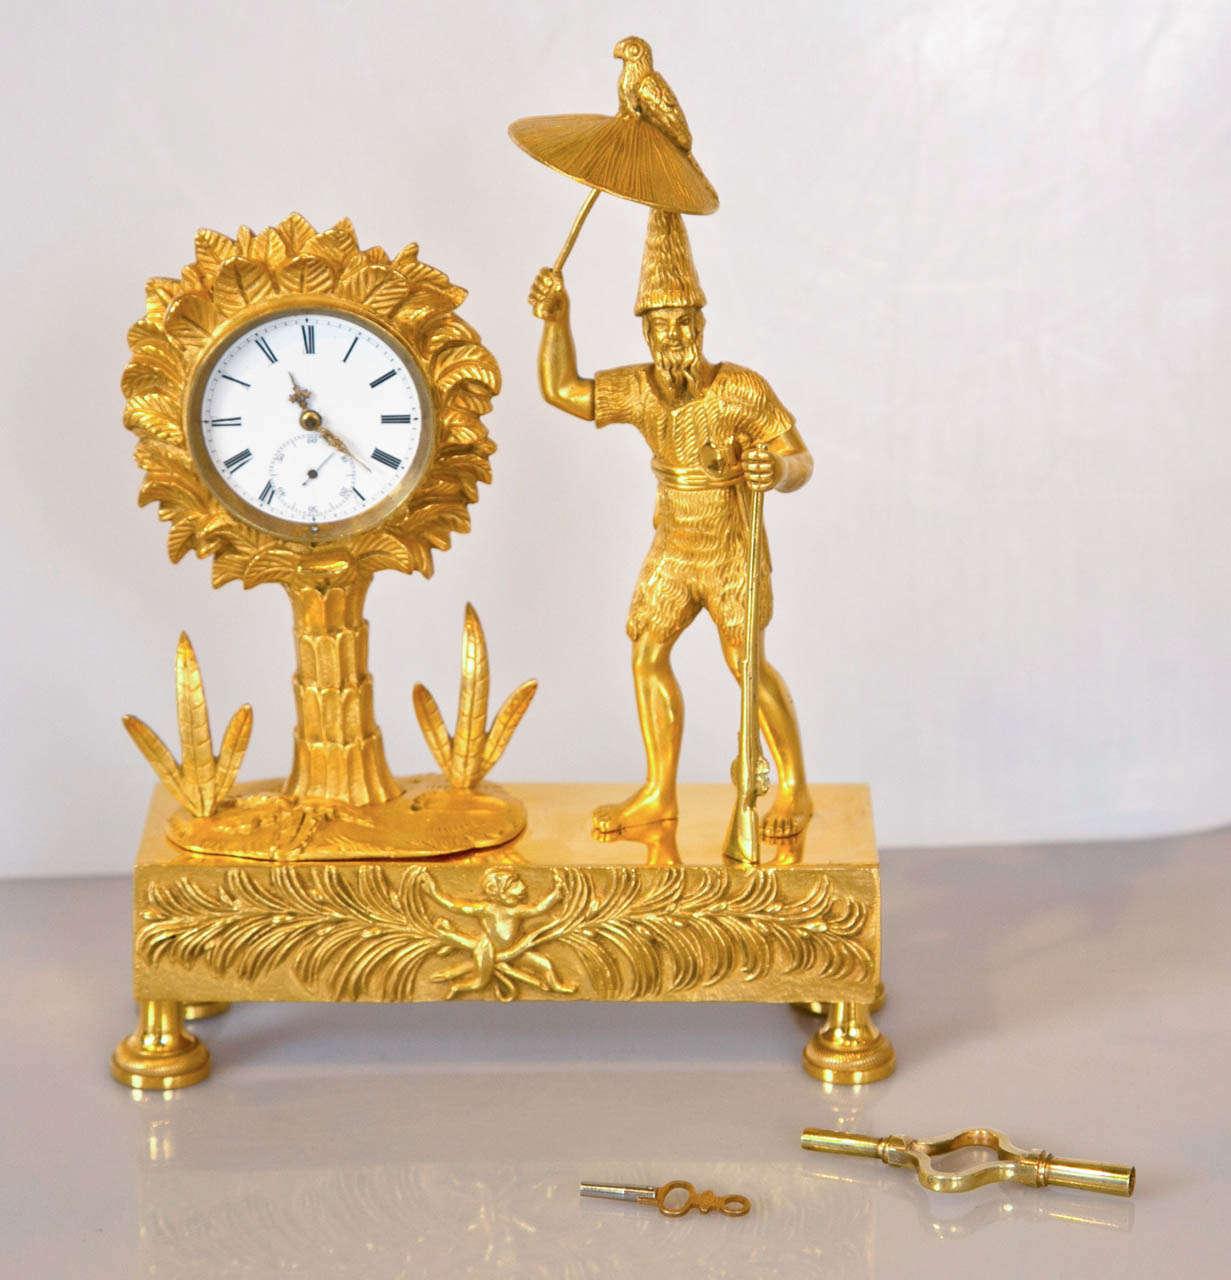 Robinson Crusoe Mantel Clock Image 2